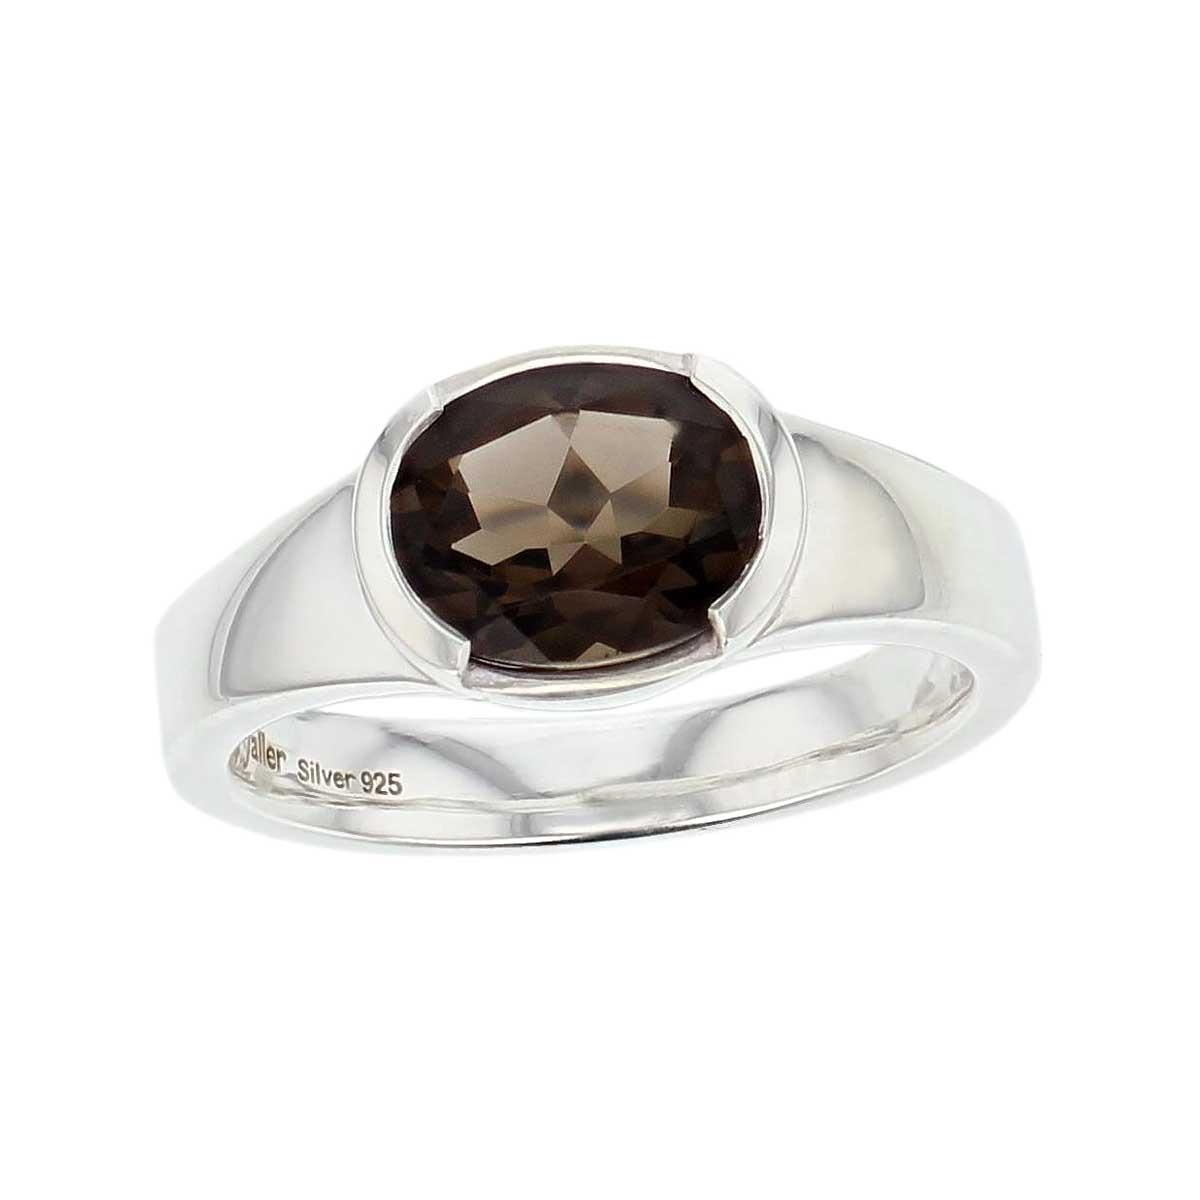 sterling silver oval cut faceted smoky quartz gemstone dress ring, designer jewellery, smokey quartz gem, jewelry, handmade by Faller, Londonderry, Northern Ireland, Irish hand crafted, darcy, D'arcy